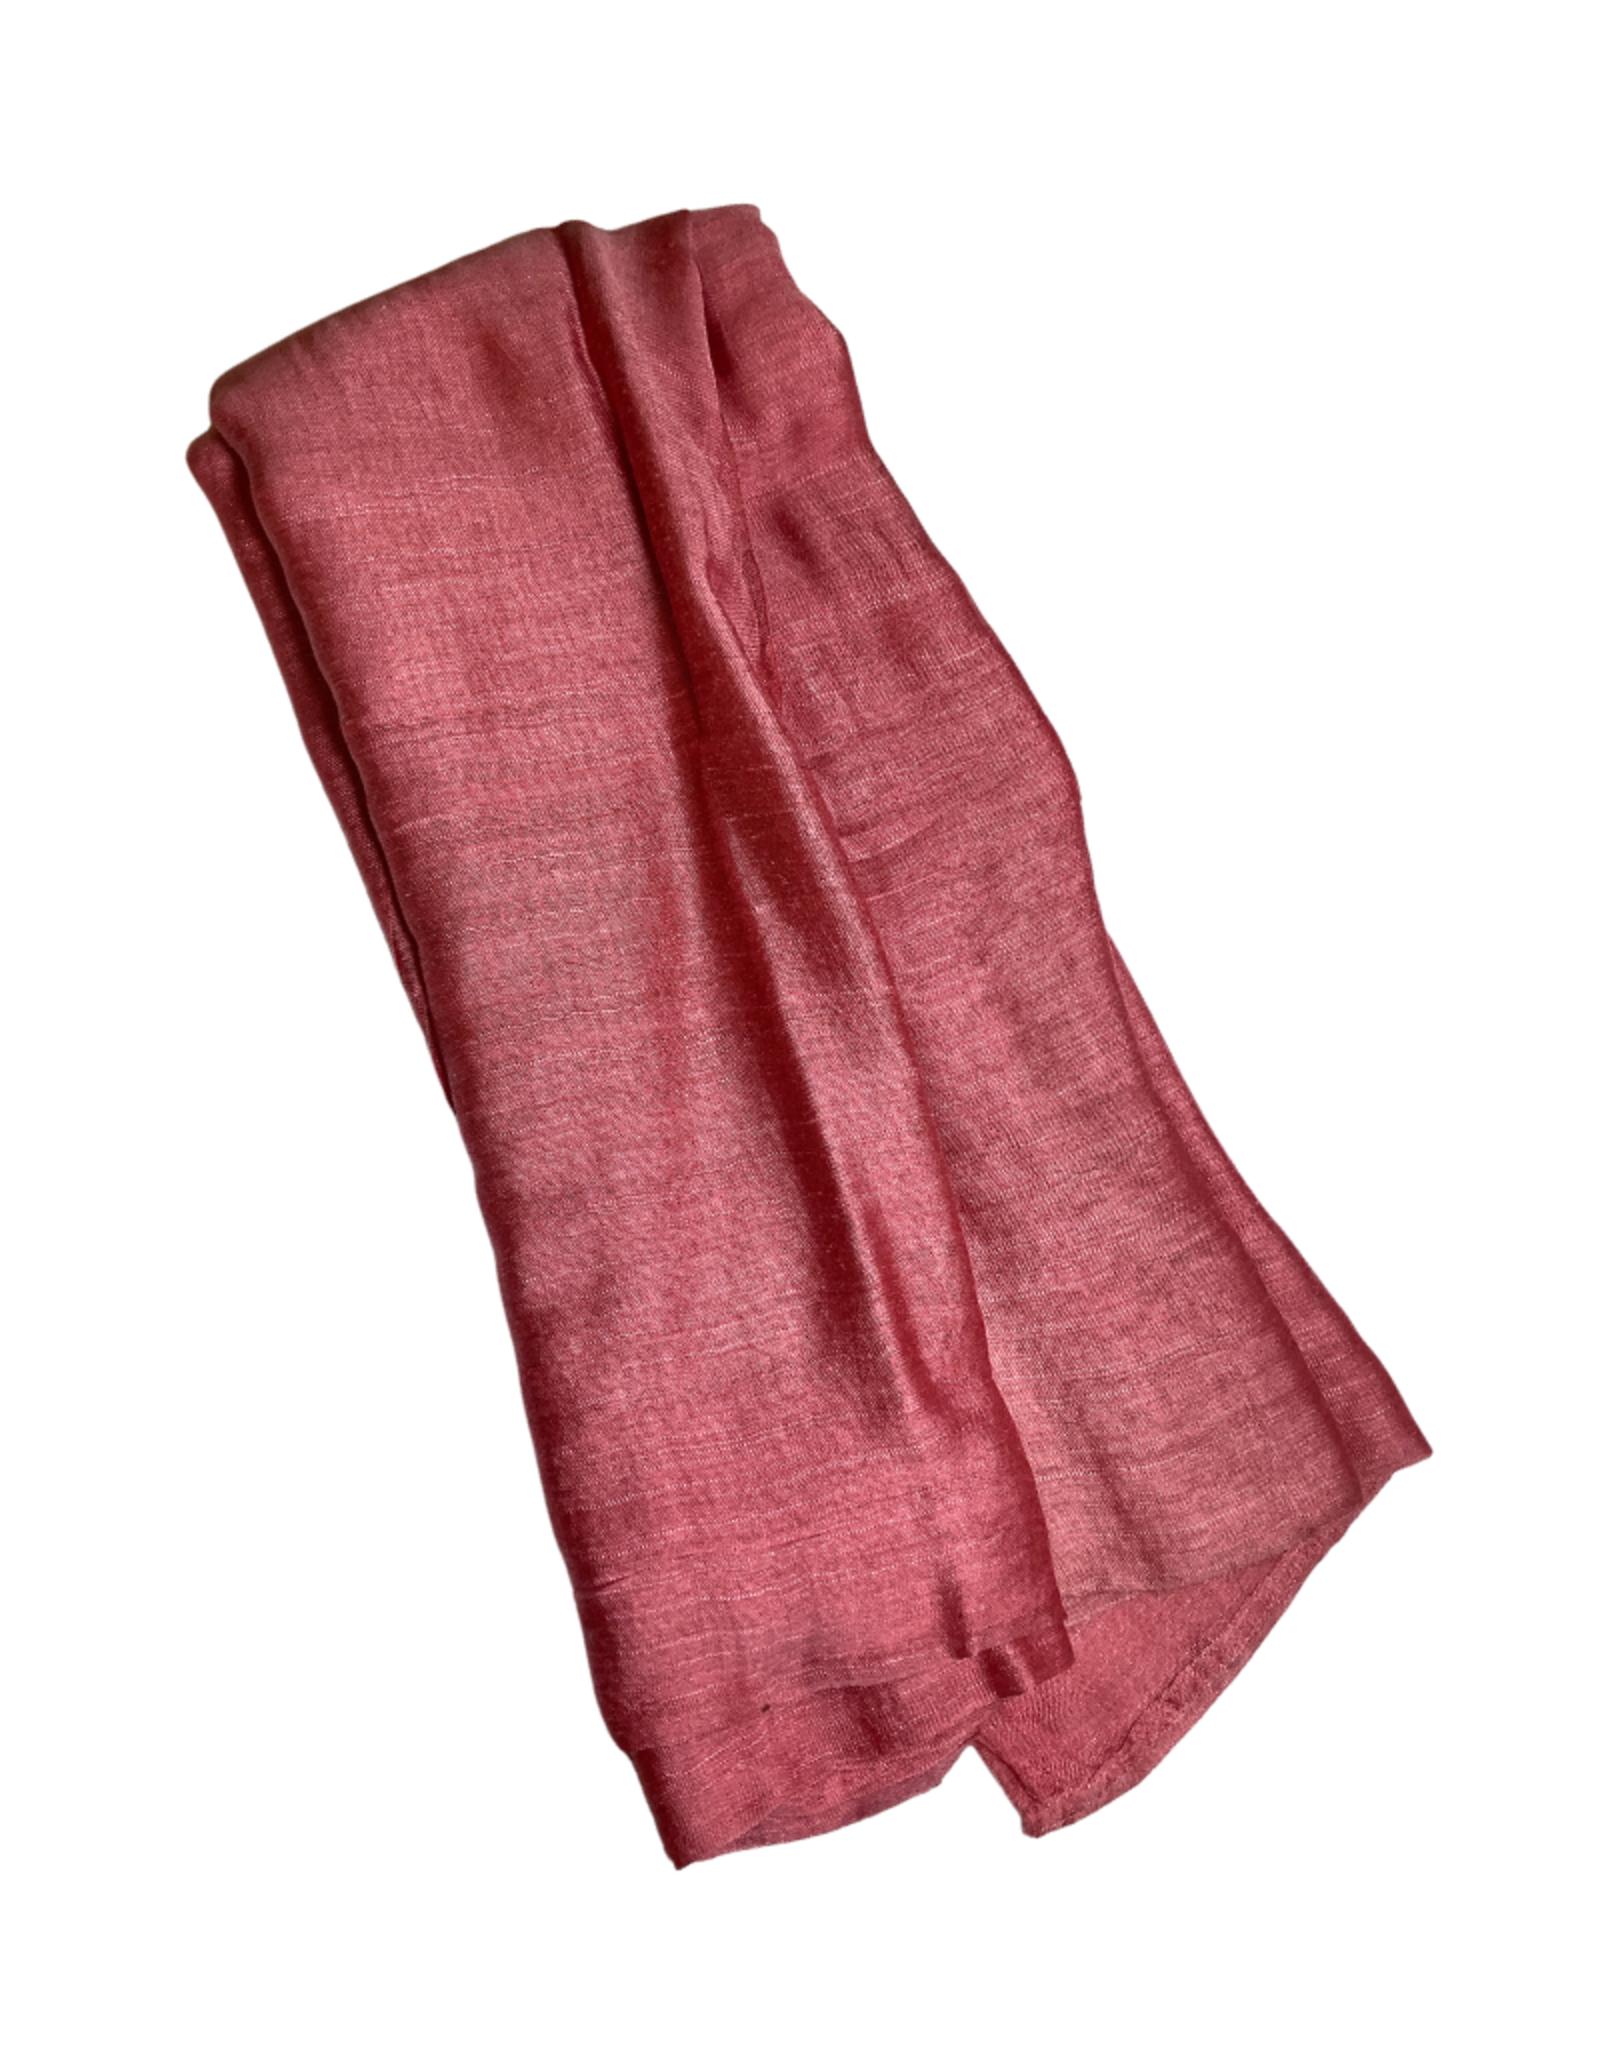 Ten Thousand Villages Rose Silk Infinity Scarf